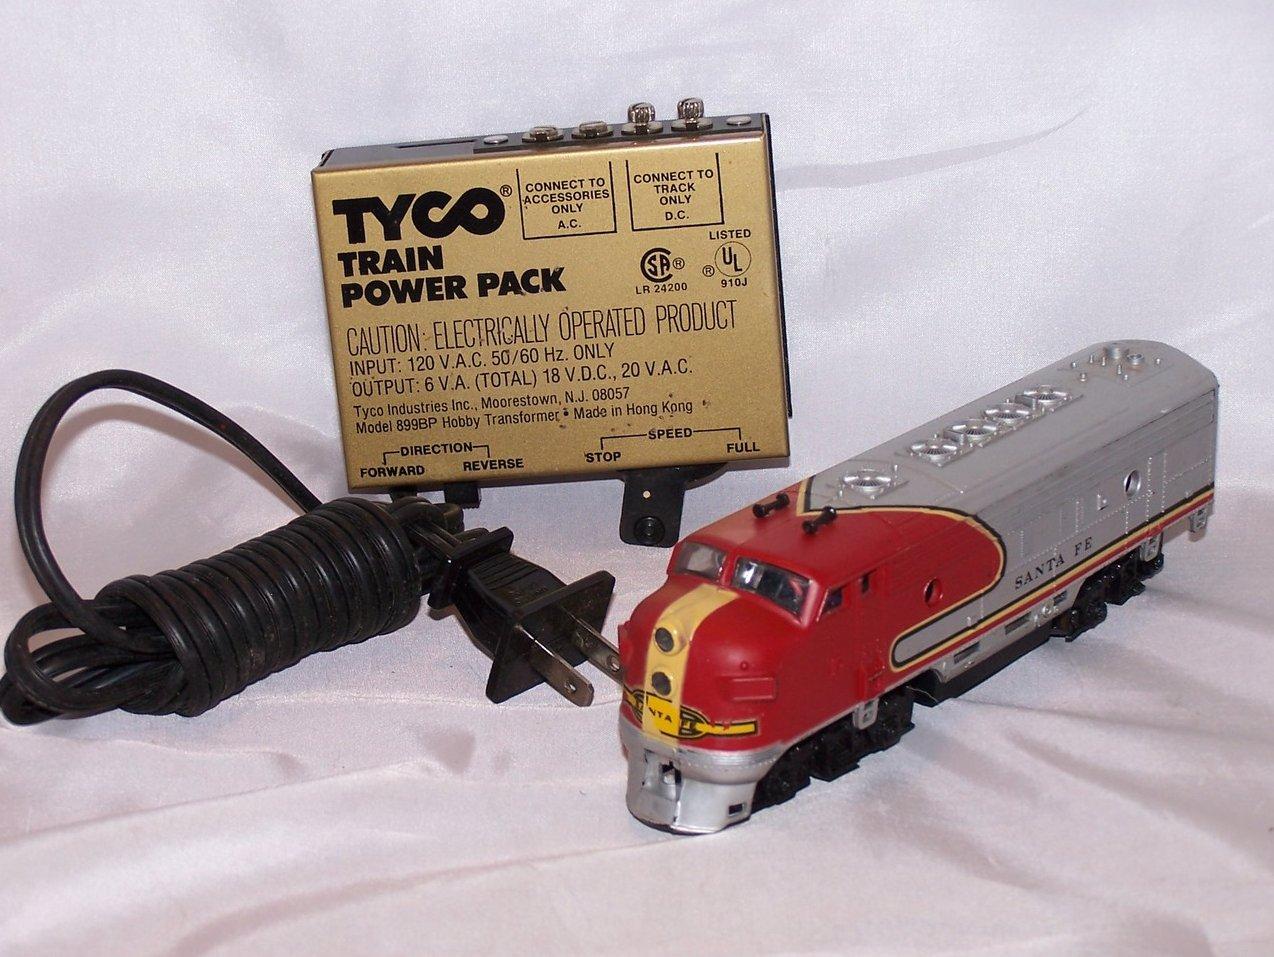 Tyco Power Pack Life Like Santa Fe Electric Train Engine